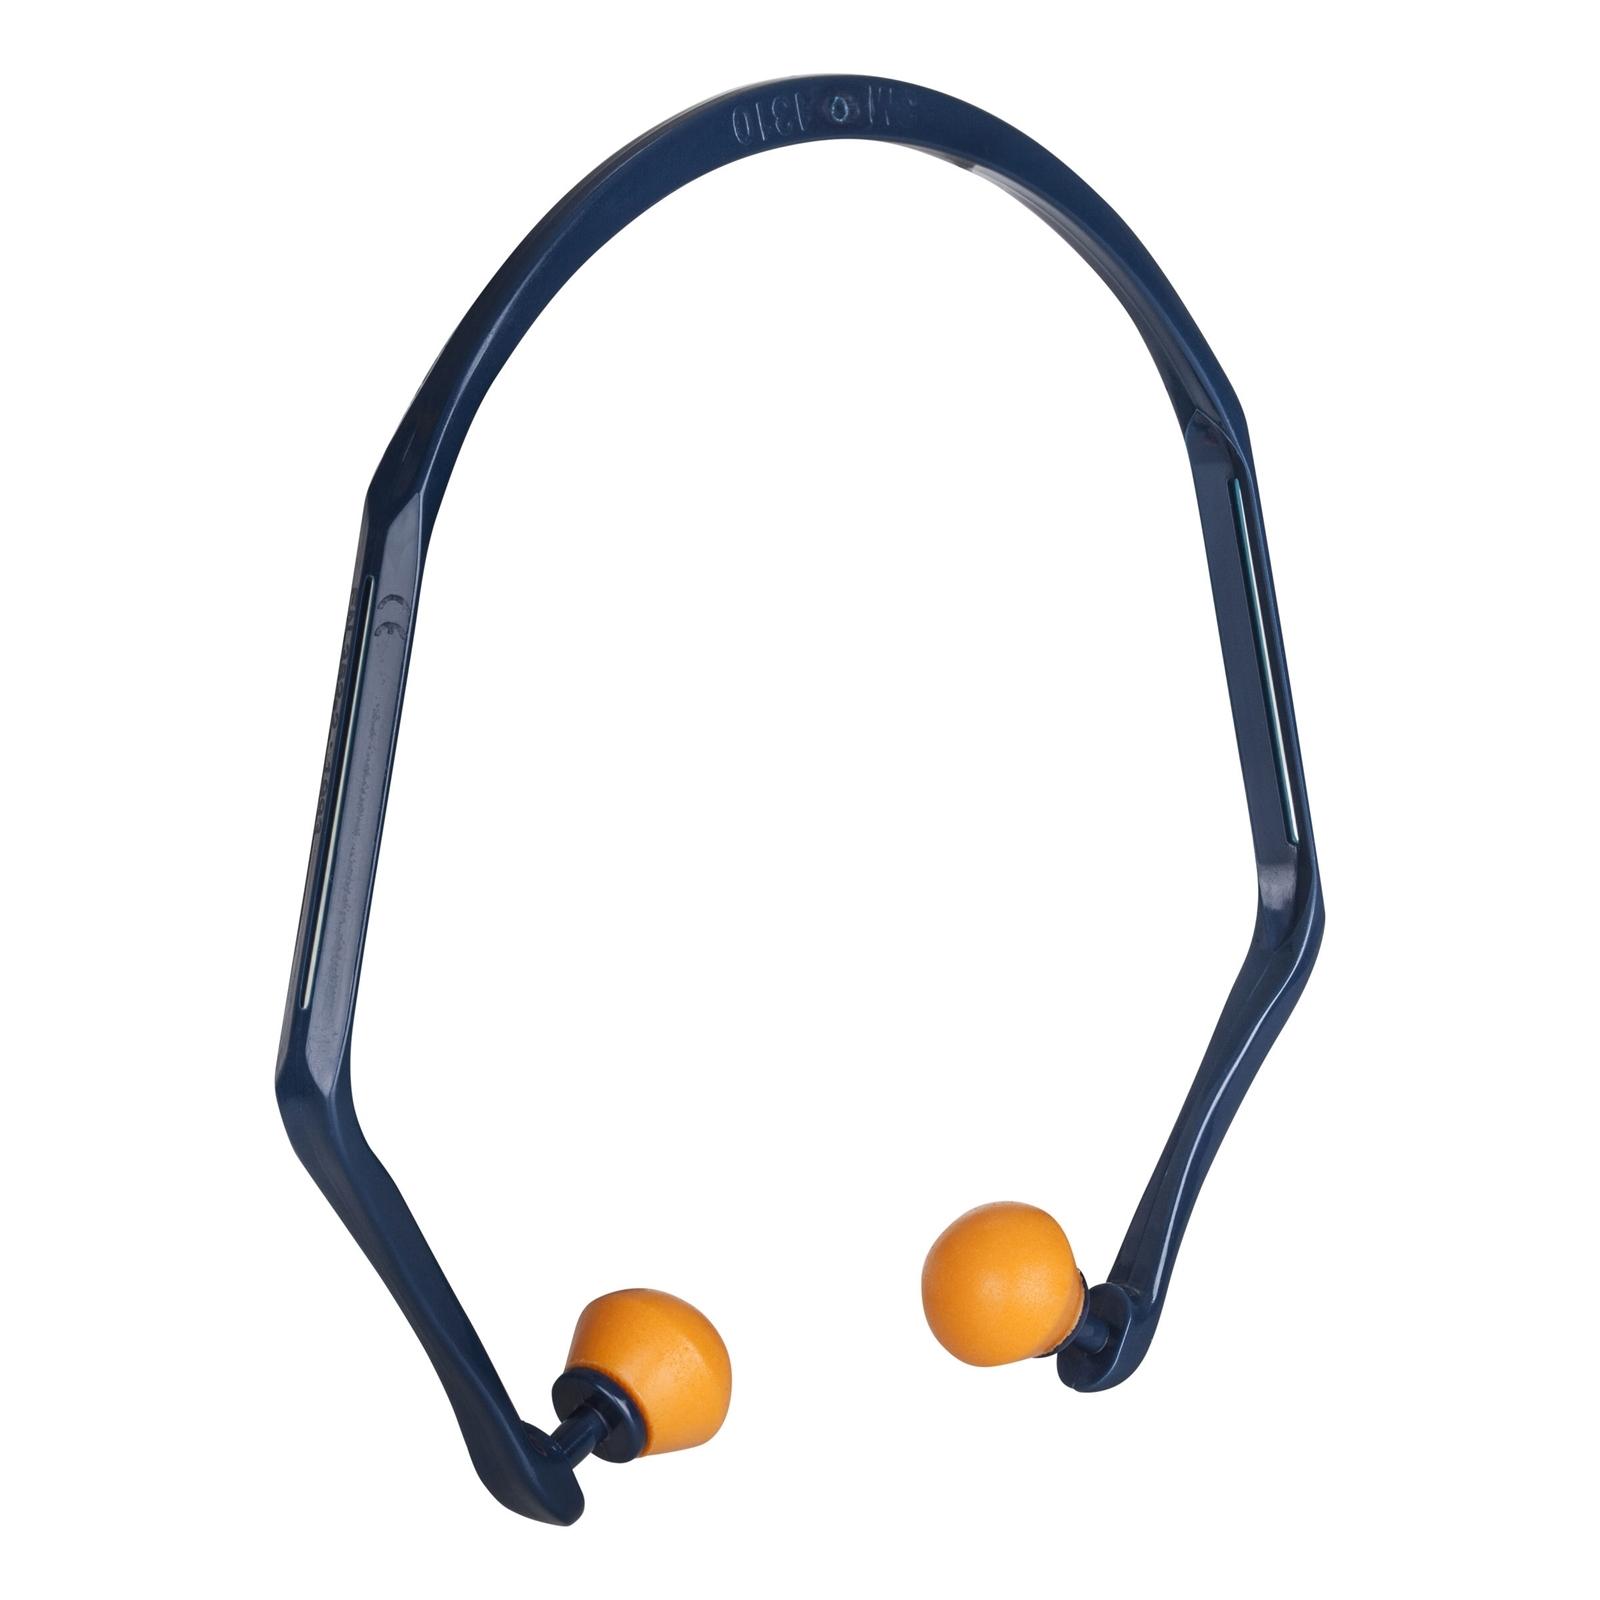 3M Banded Reusable Ear Plugs 18dB